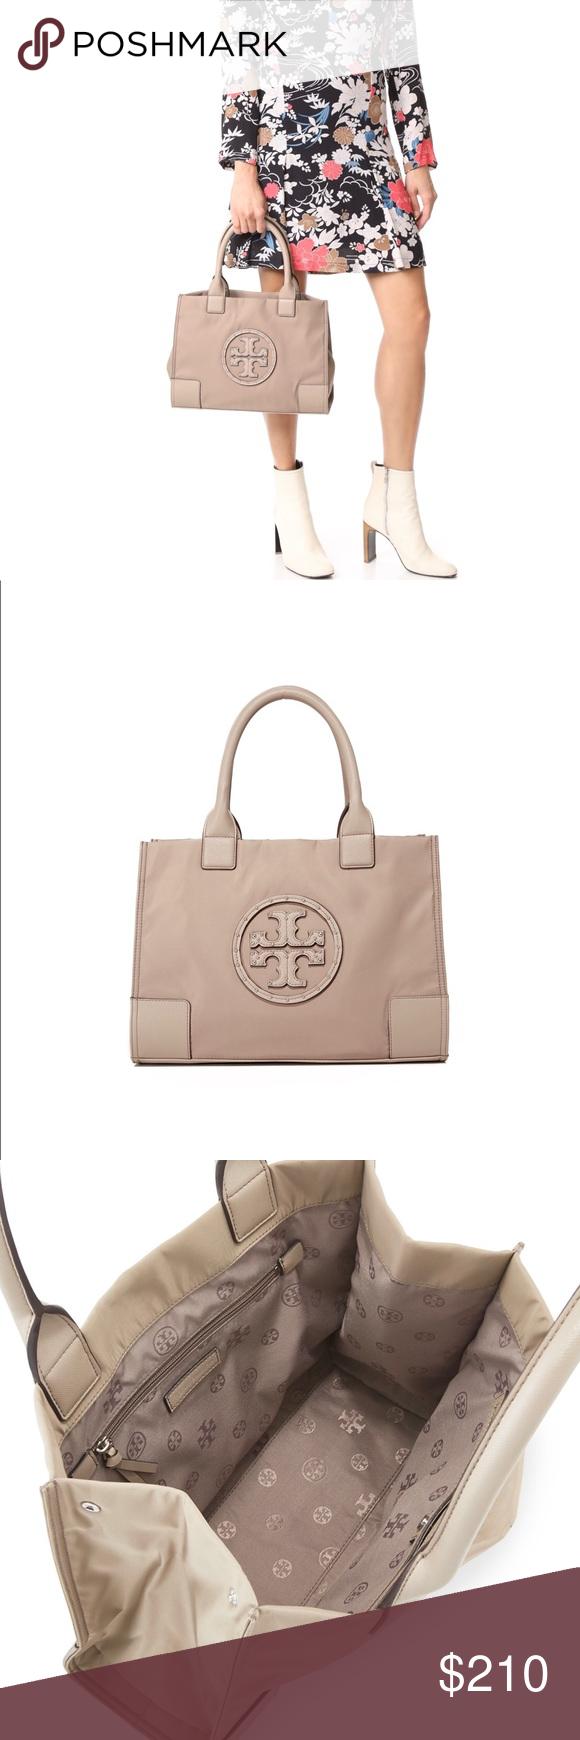 d675ae16963 NWT Tory Burch Ella Studded Mini Tote, French Gray Tory Burch nylon tote bag  with